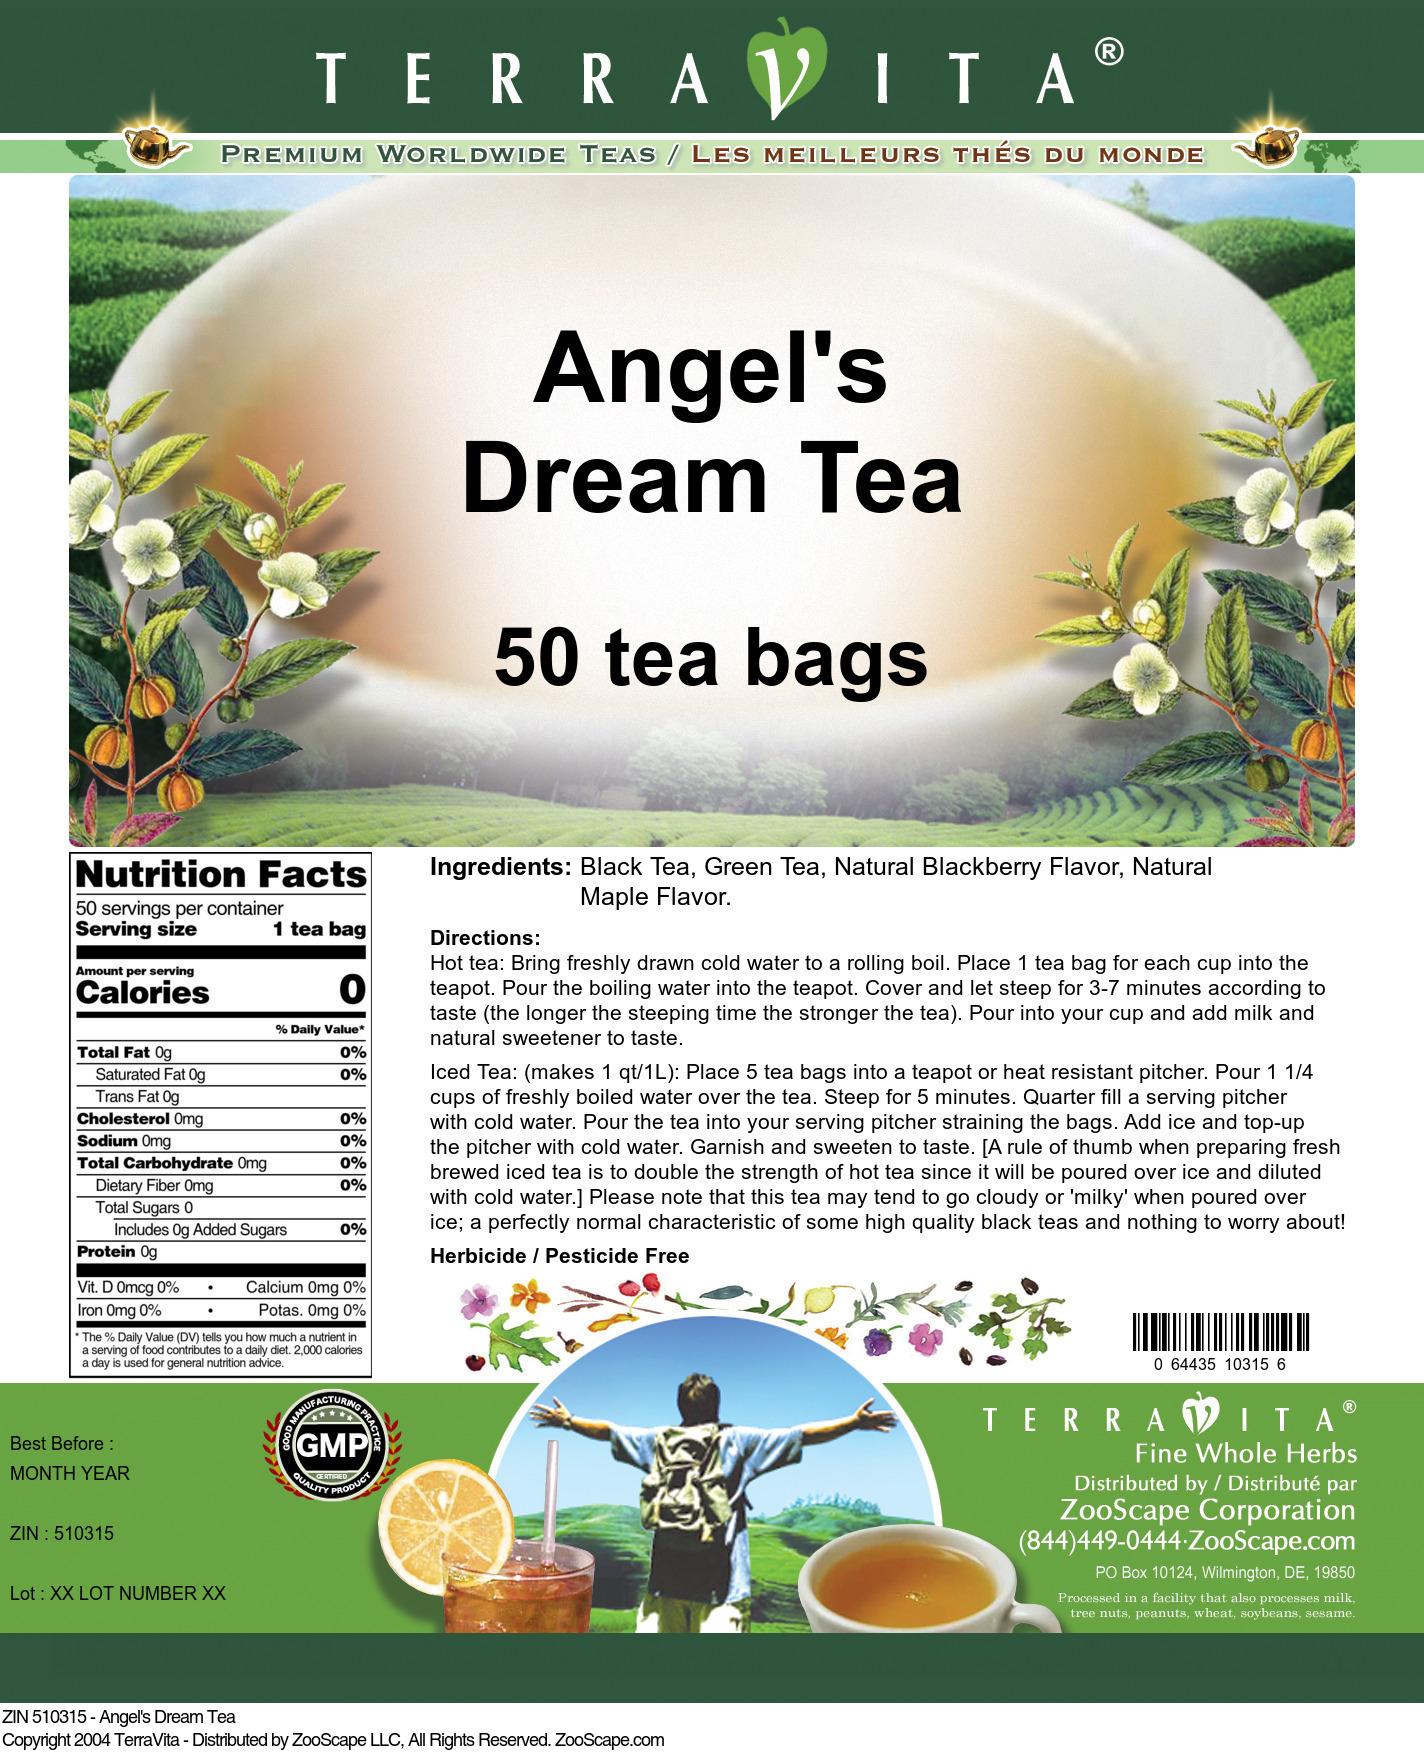 Angel's Dream Tea